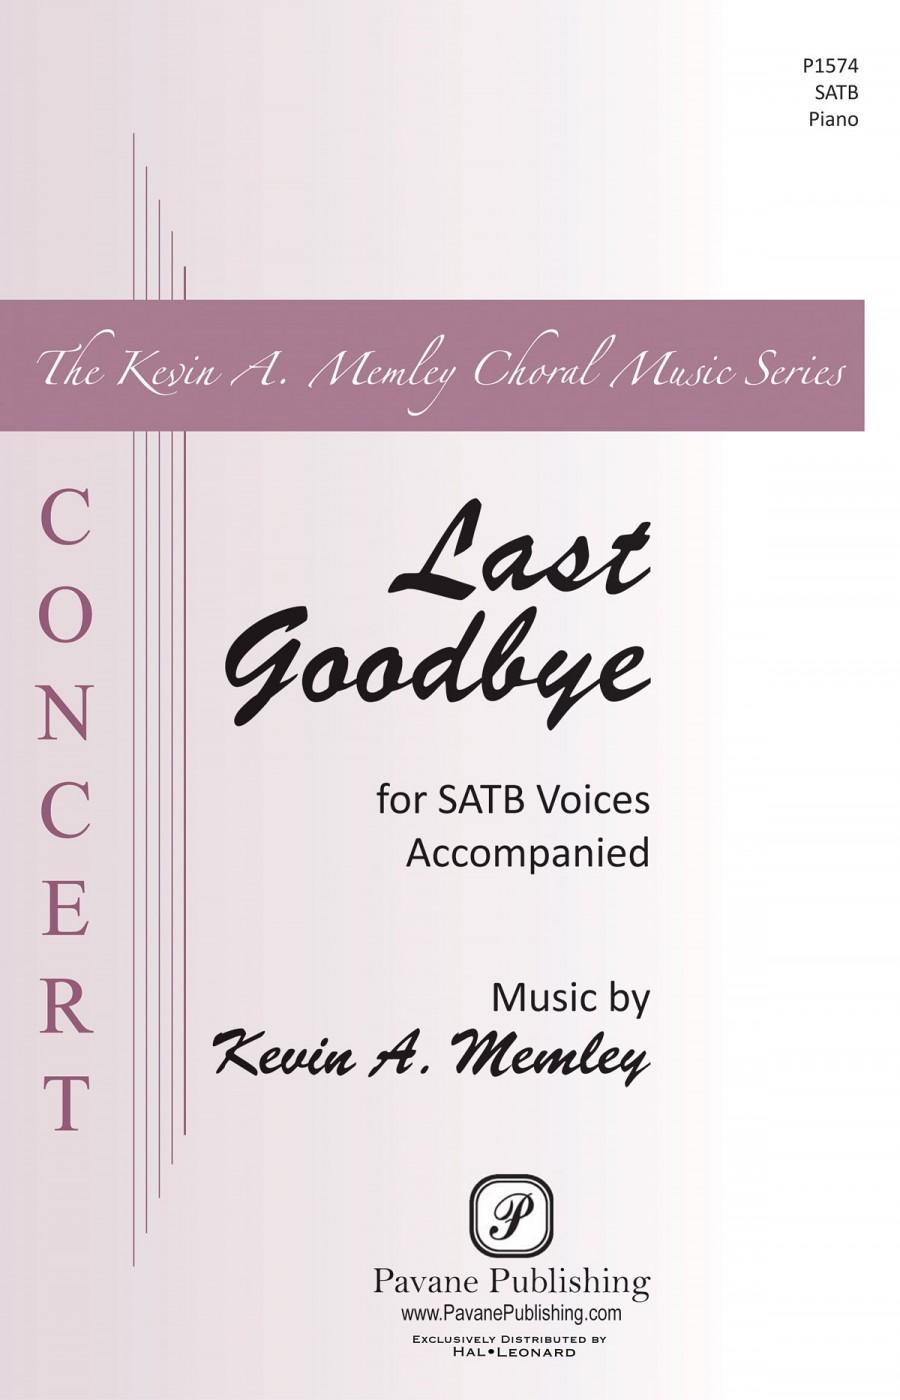 Kevin A  Memley: Last Goodbye   Presto Sheet Music